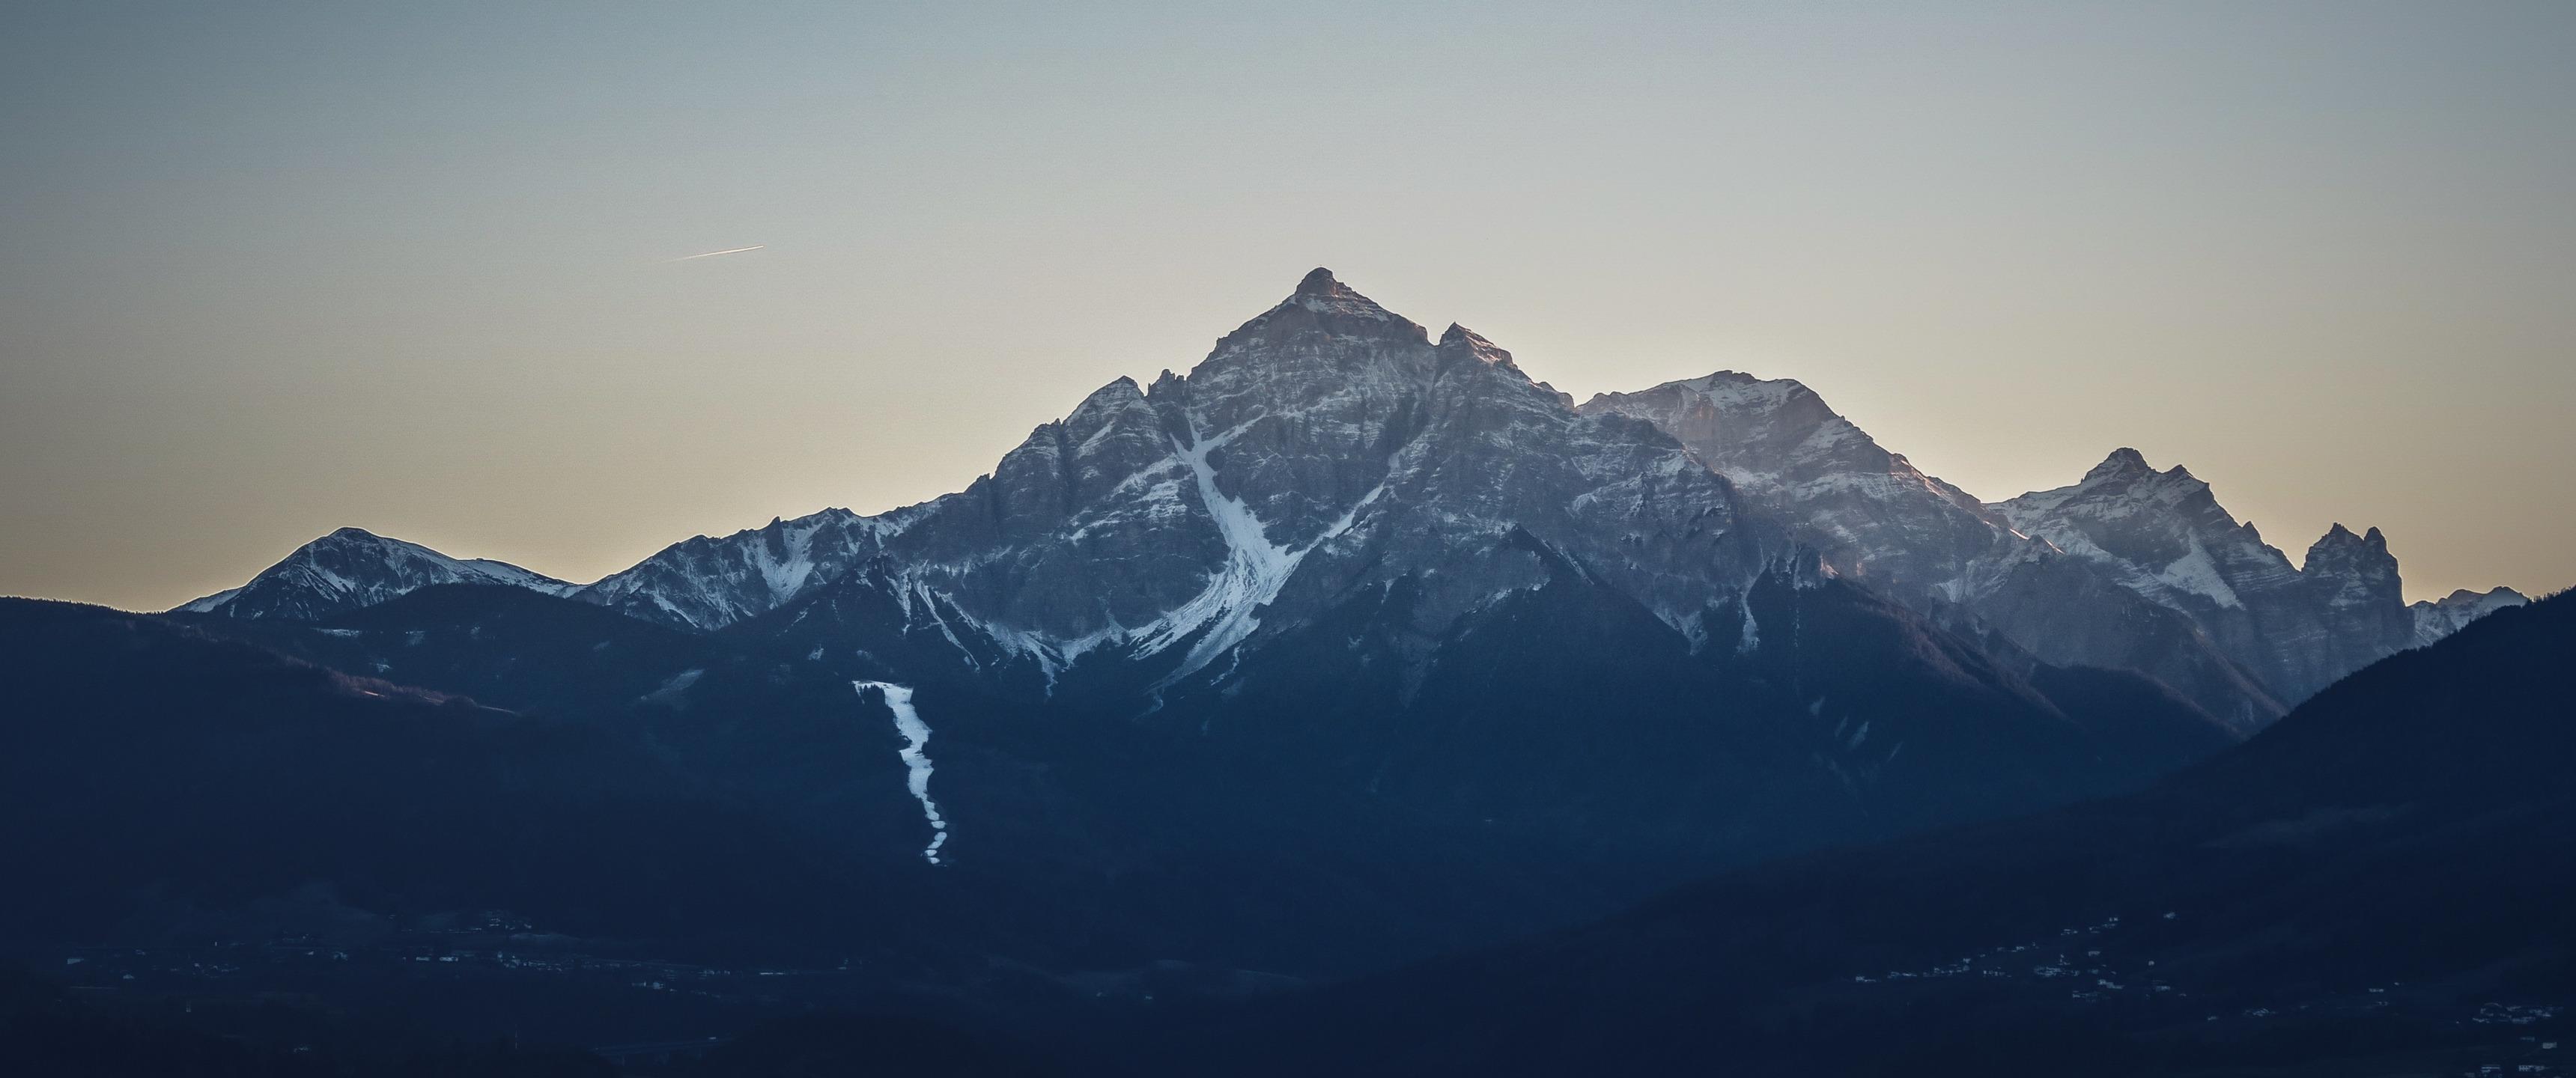 Wallpaper : 3440x1440 px, mountains